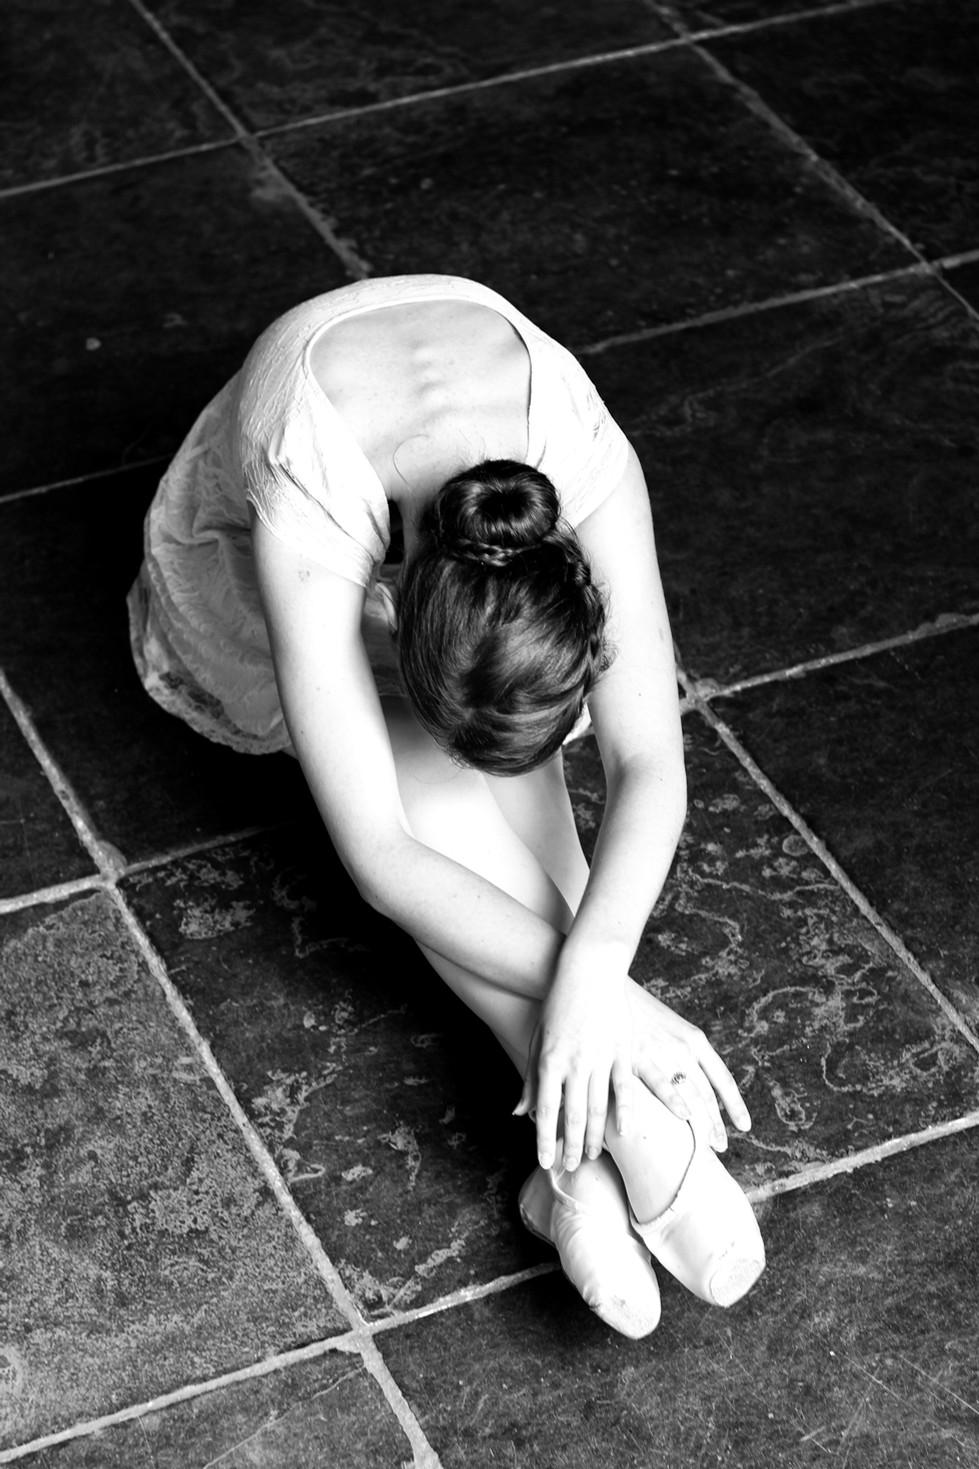 Throwback-thursday: ballerina-photoshoot uit 2013